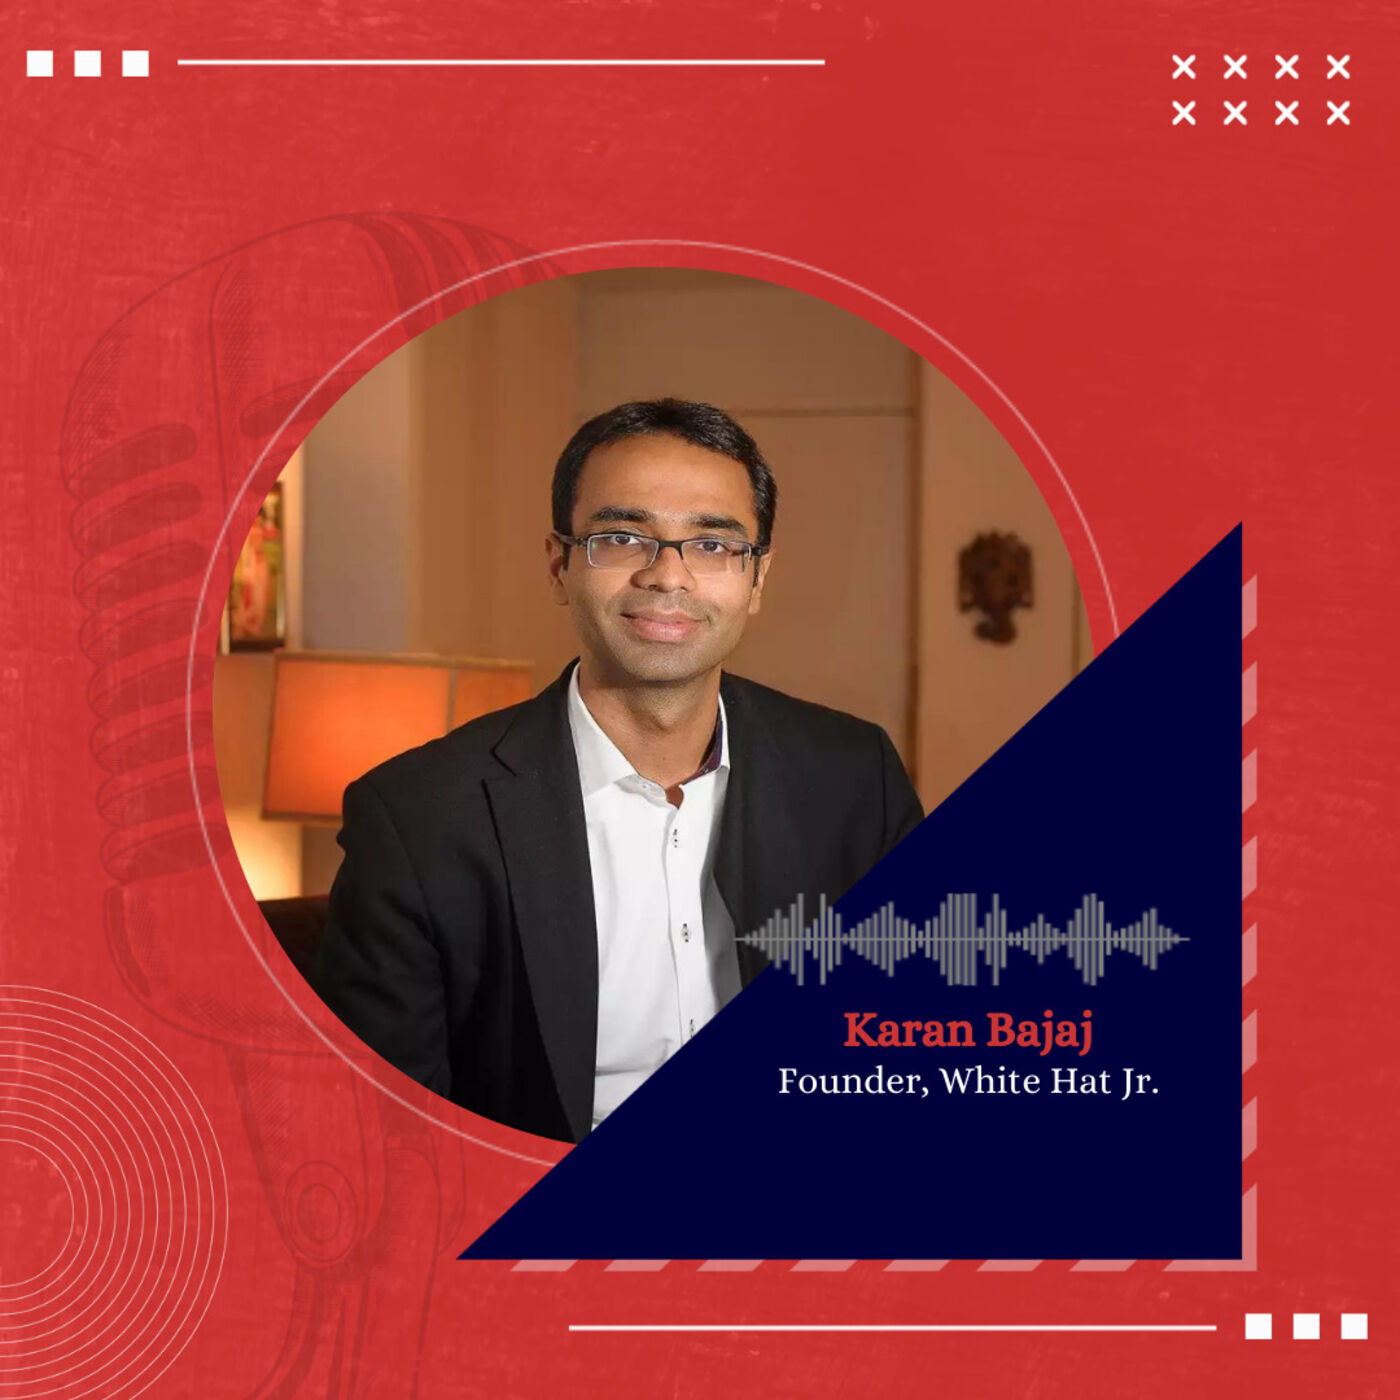 The unconventional journey of Karan Bajaj, Founder, WhiteHatJr